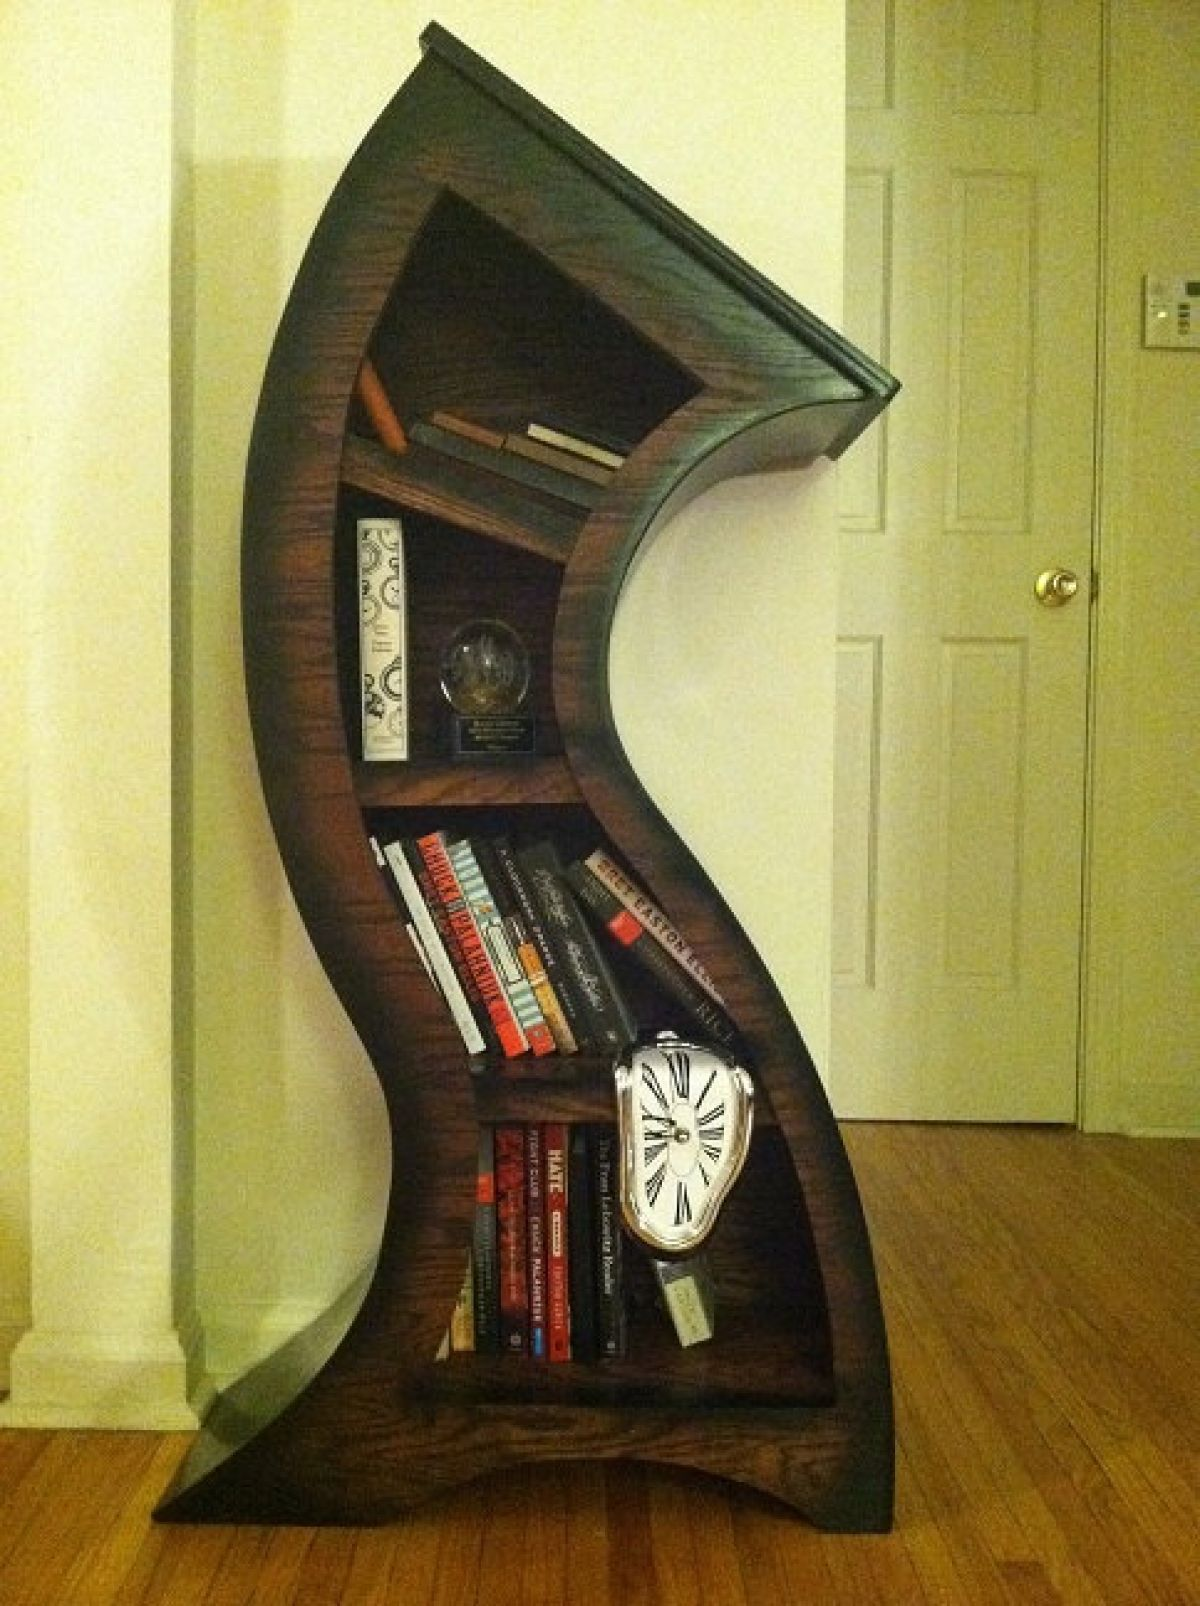 Love this Wonderland styled curved bookshelf and Dali clock